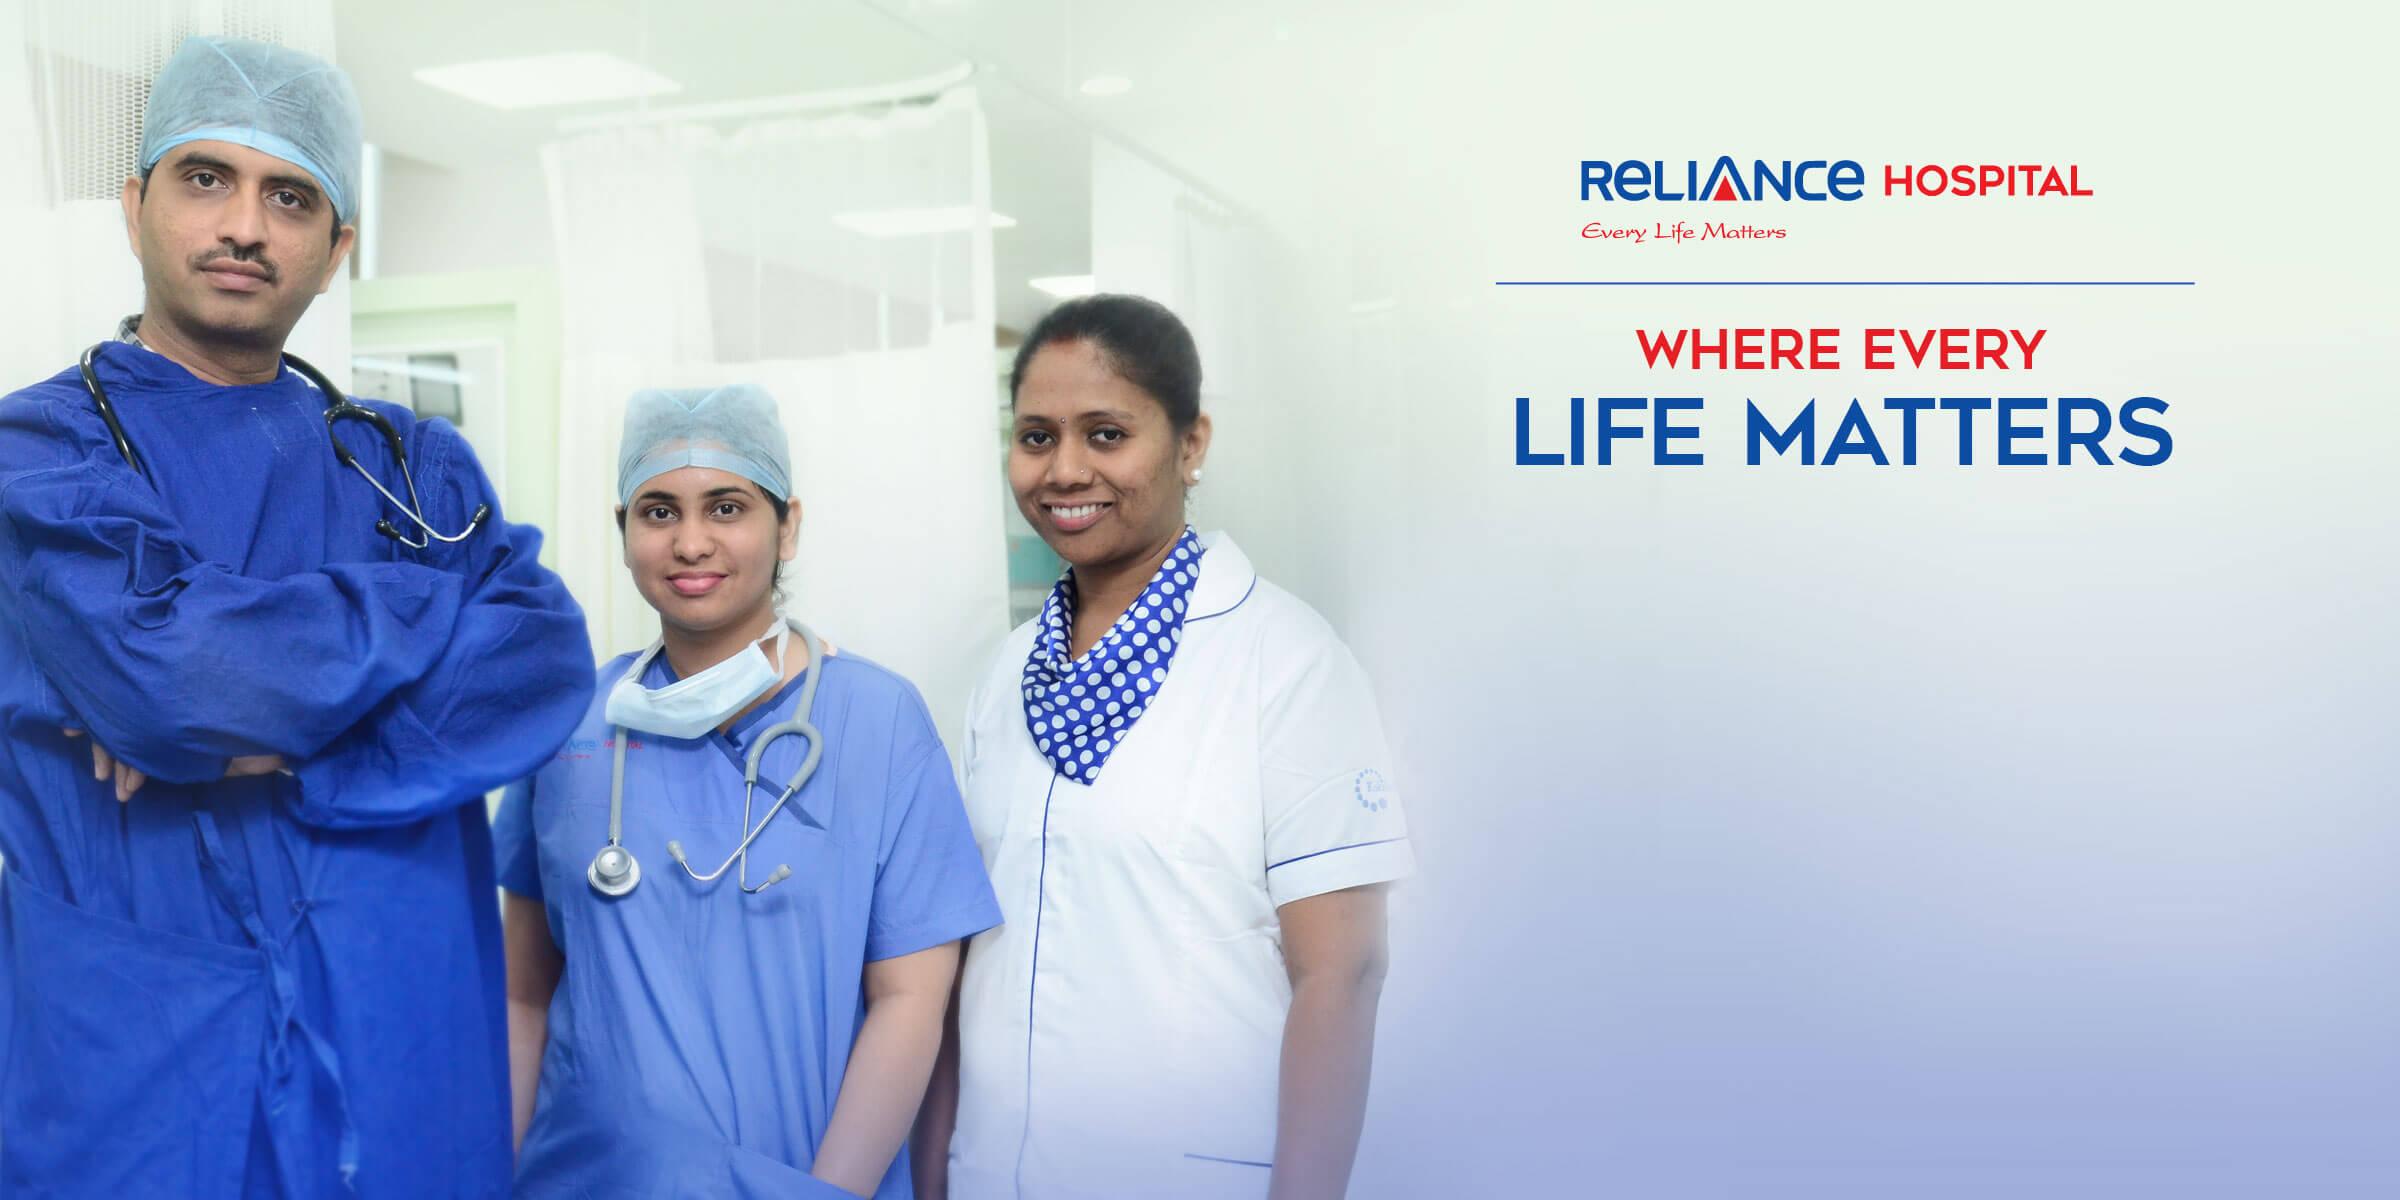 sixth Image - Reliance Hospital